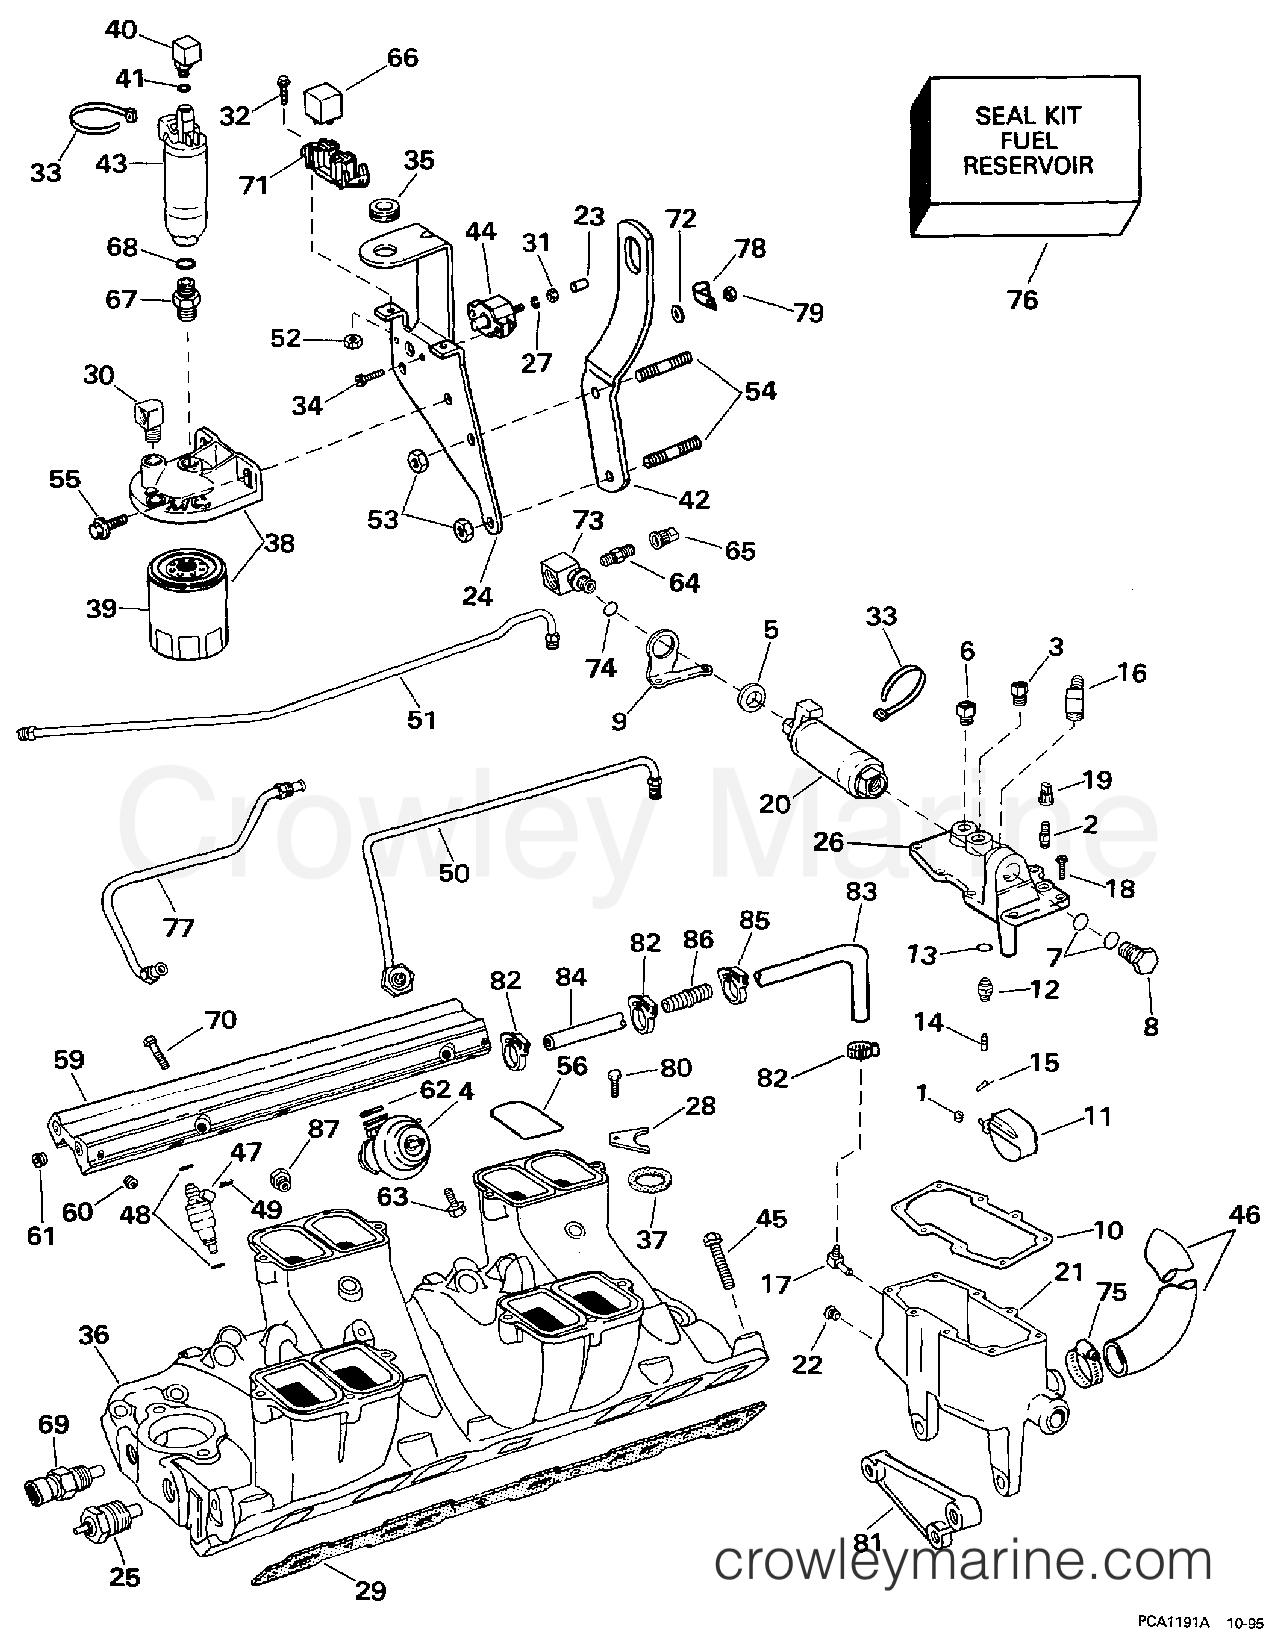 1997 OMC Stern Drive 7.4 - 744FPLKD FUEL SYSTEM & LOWER INTAKE MANIFOLD - MPFI MODELS section